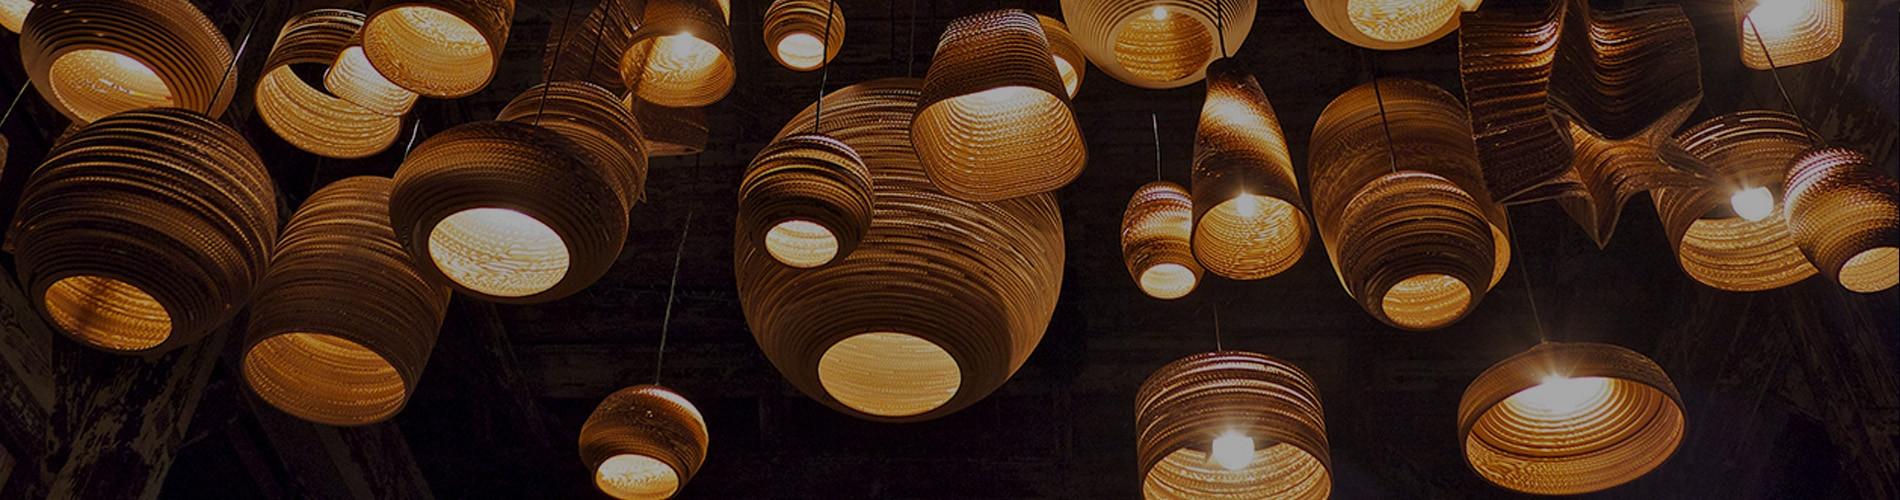 Designer Chandeliers   Crystal   Glass   Brass  